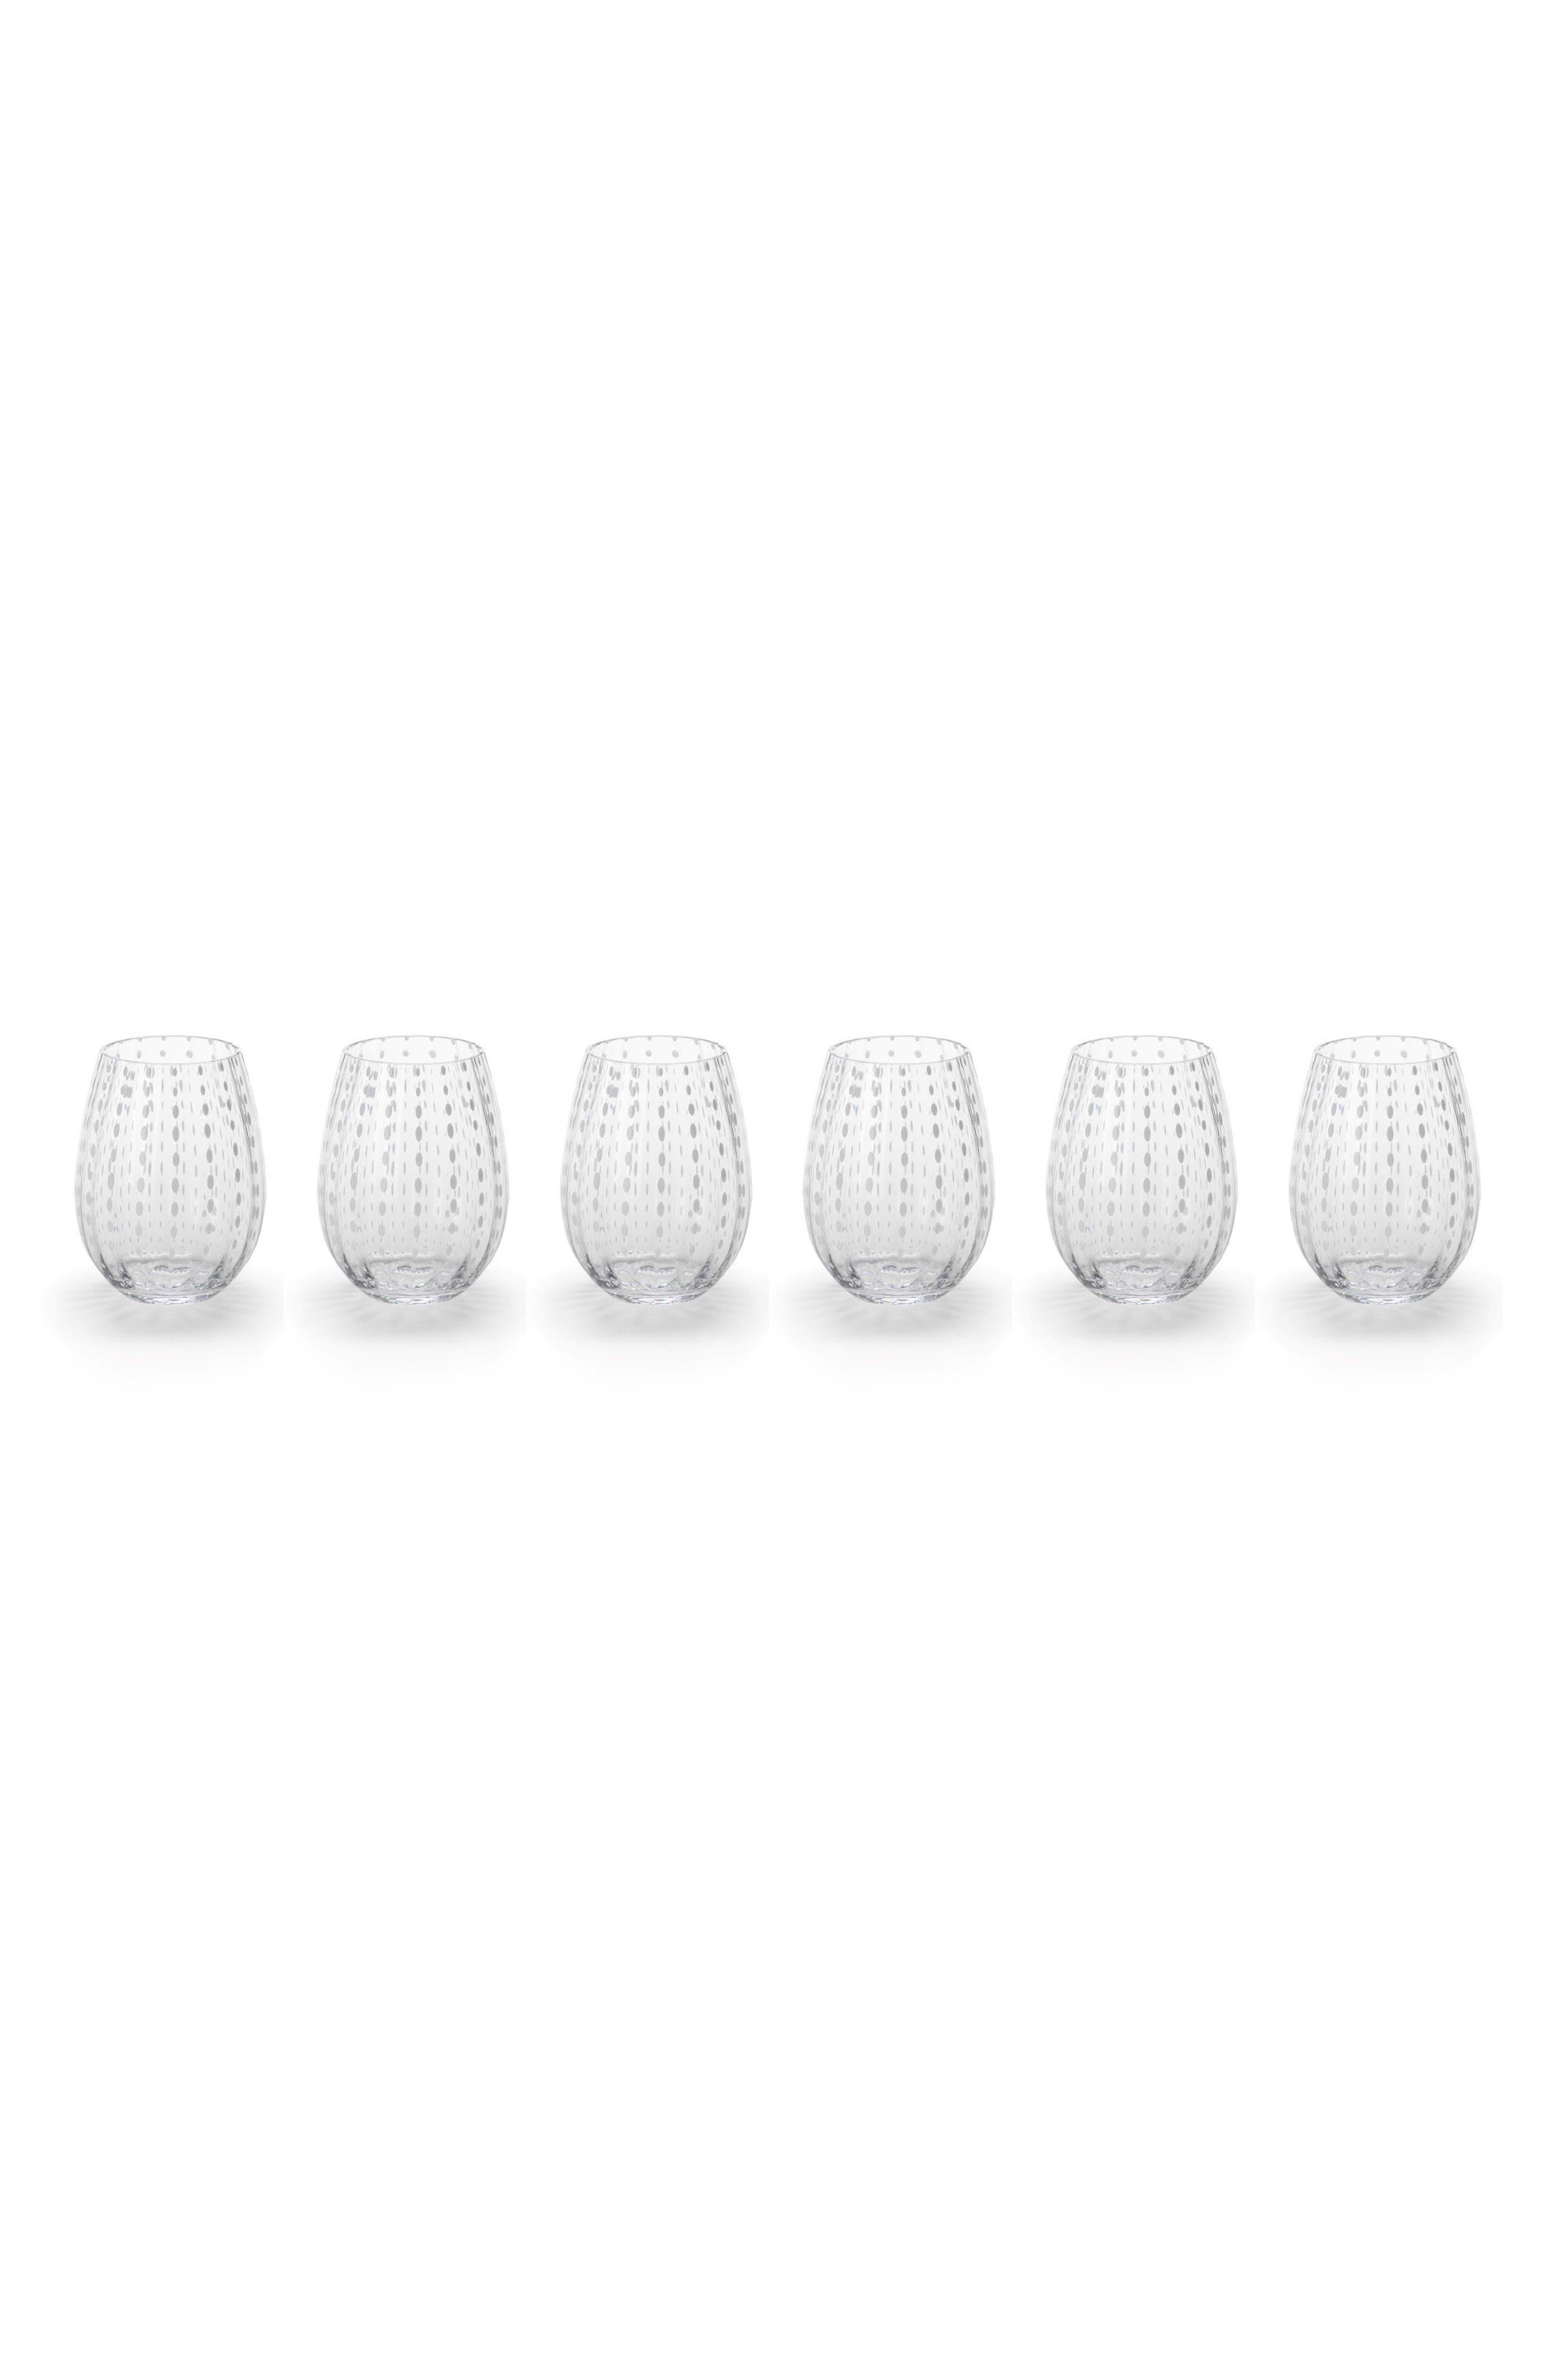 Zodax Fintan Set of 6 Stemless Wine Glasses